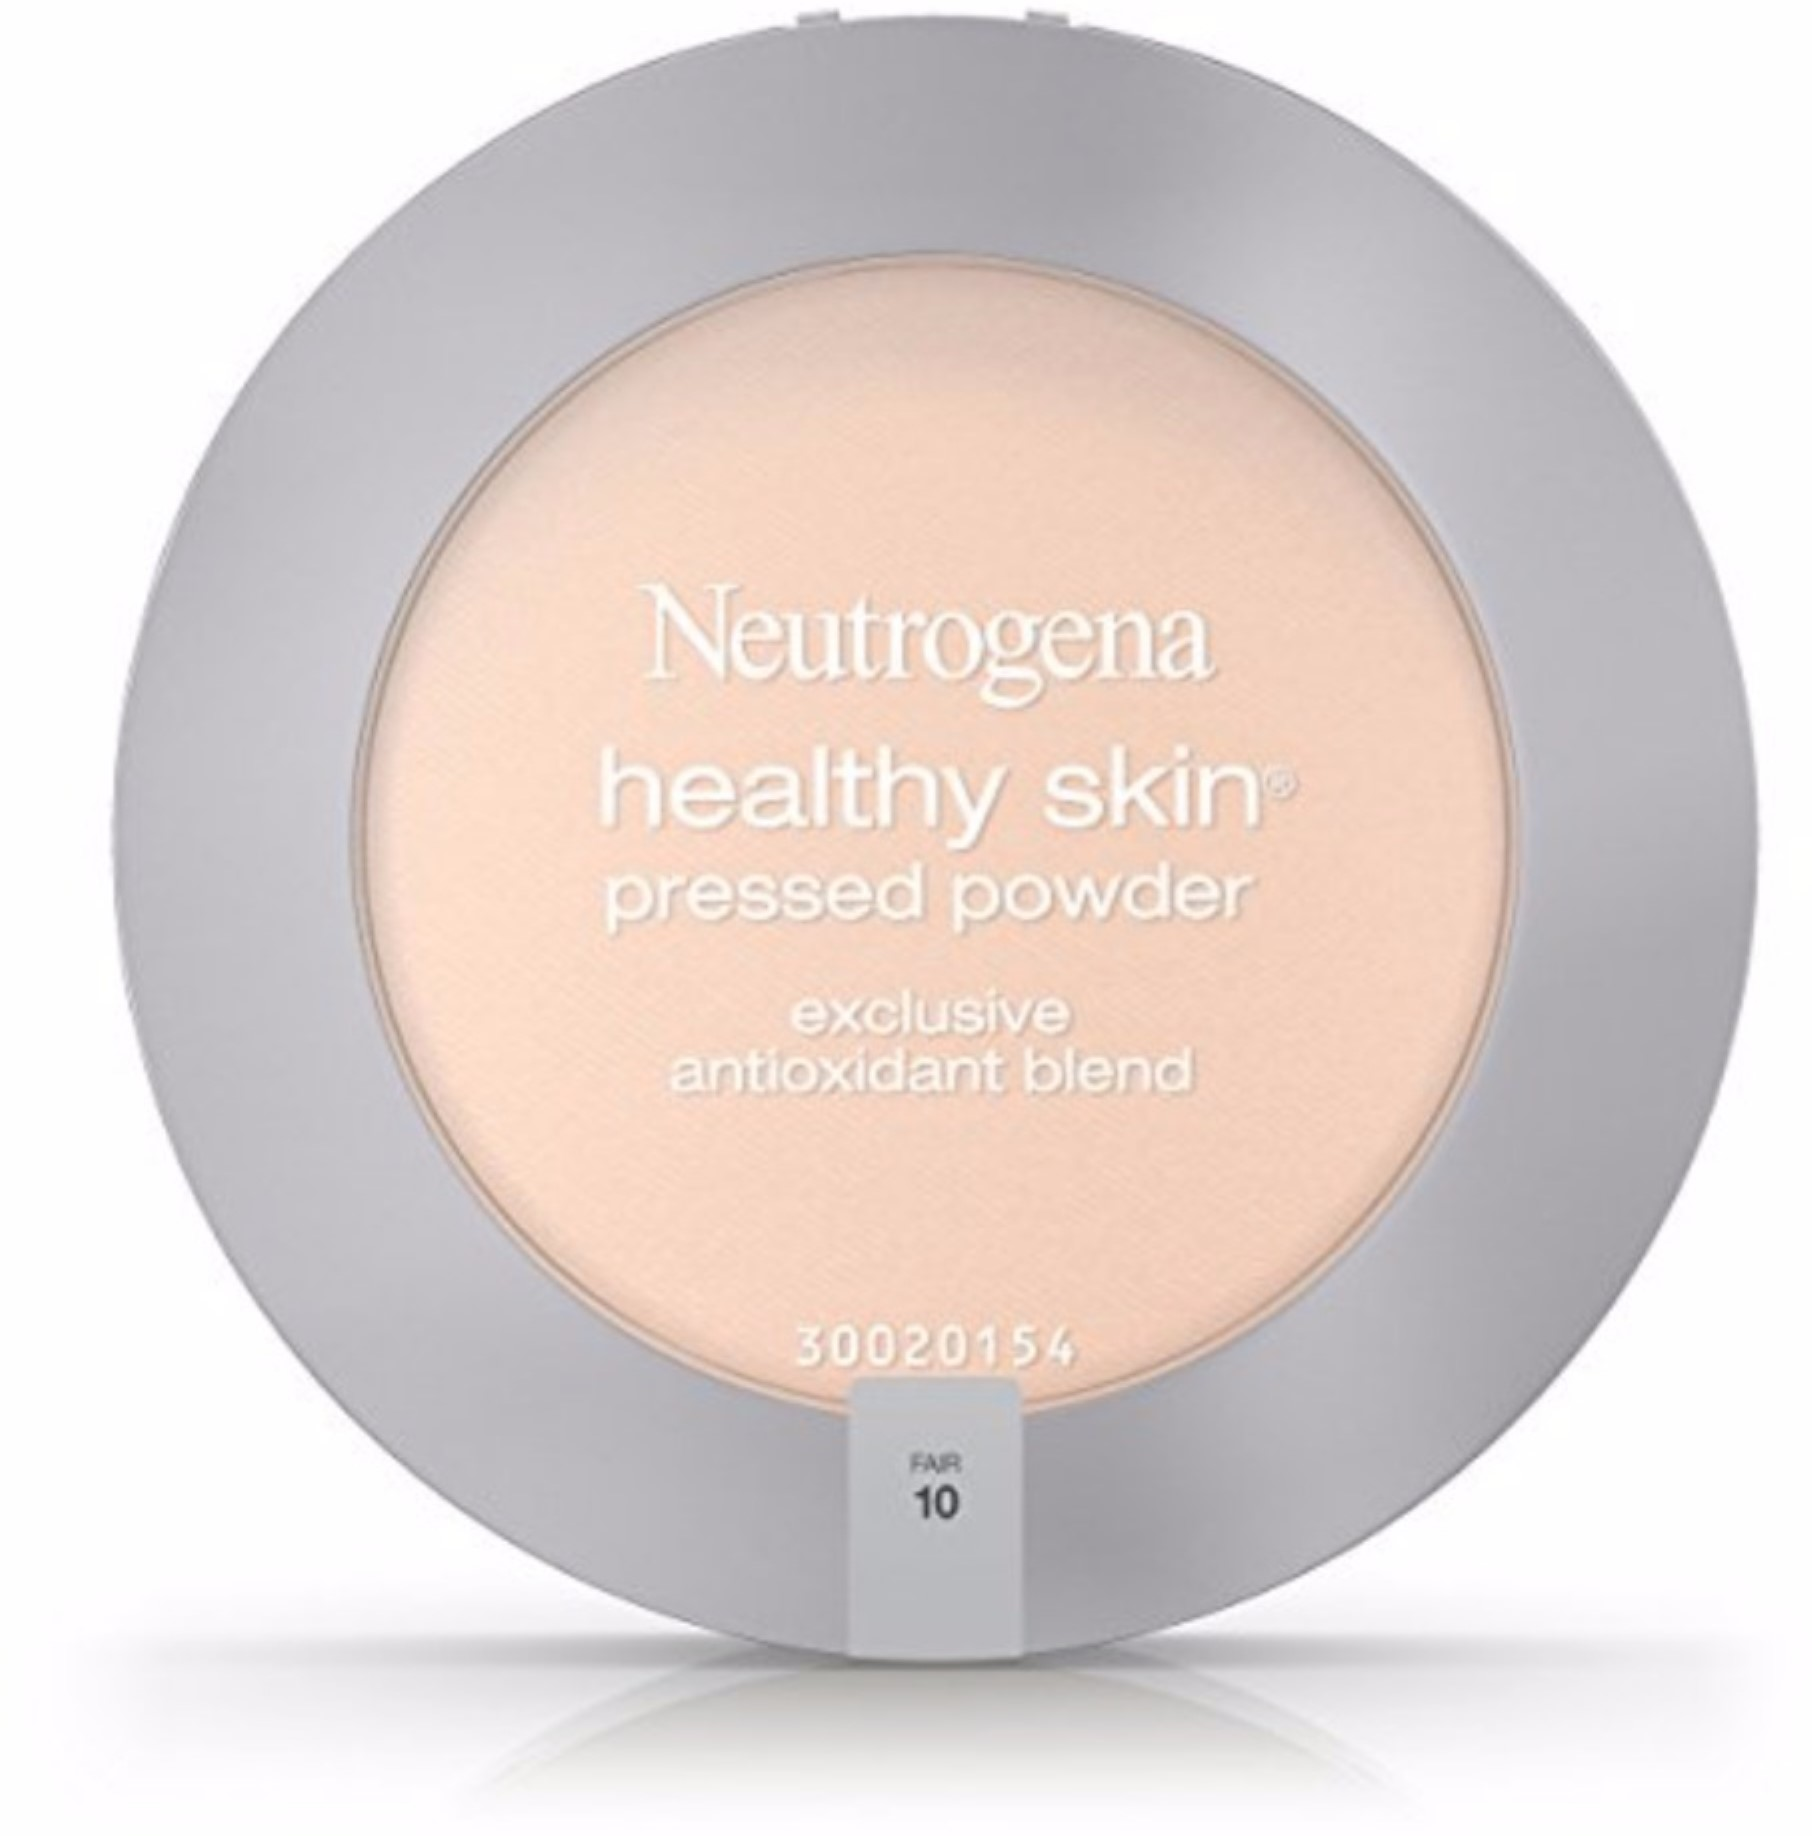 4 Pack - Neutrogena Healthy Skin Pressed Powder Spf 20, Fair [10] 0.34 oz